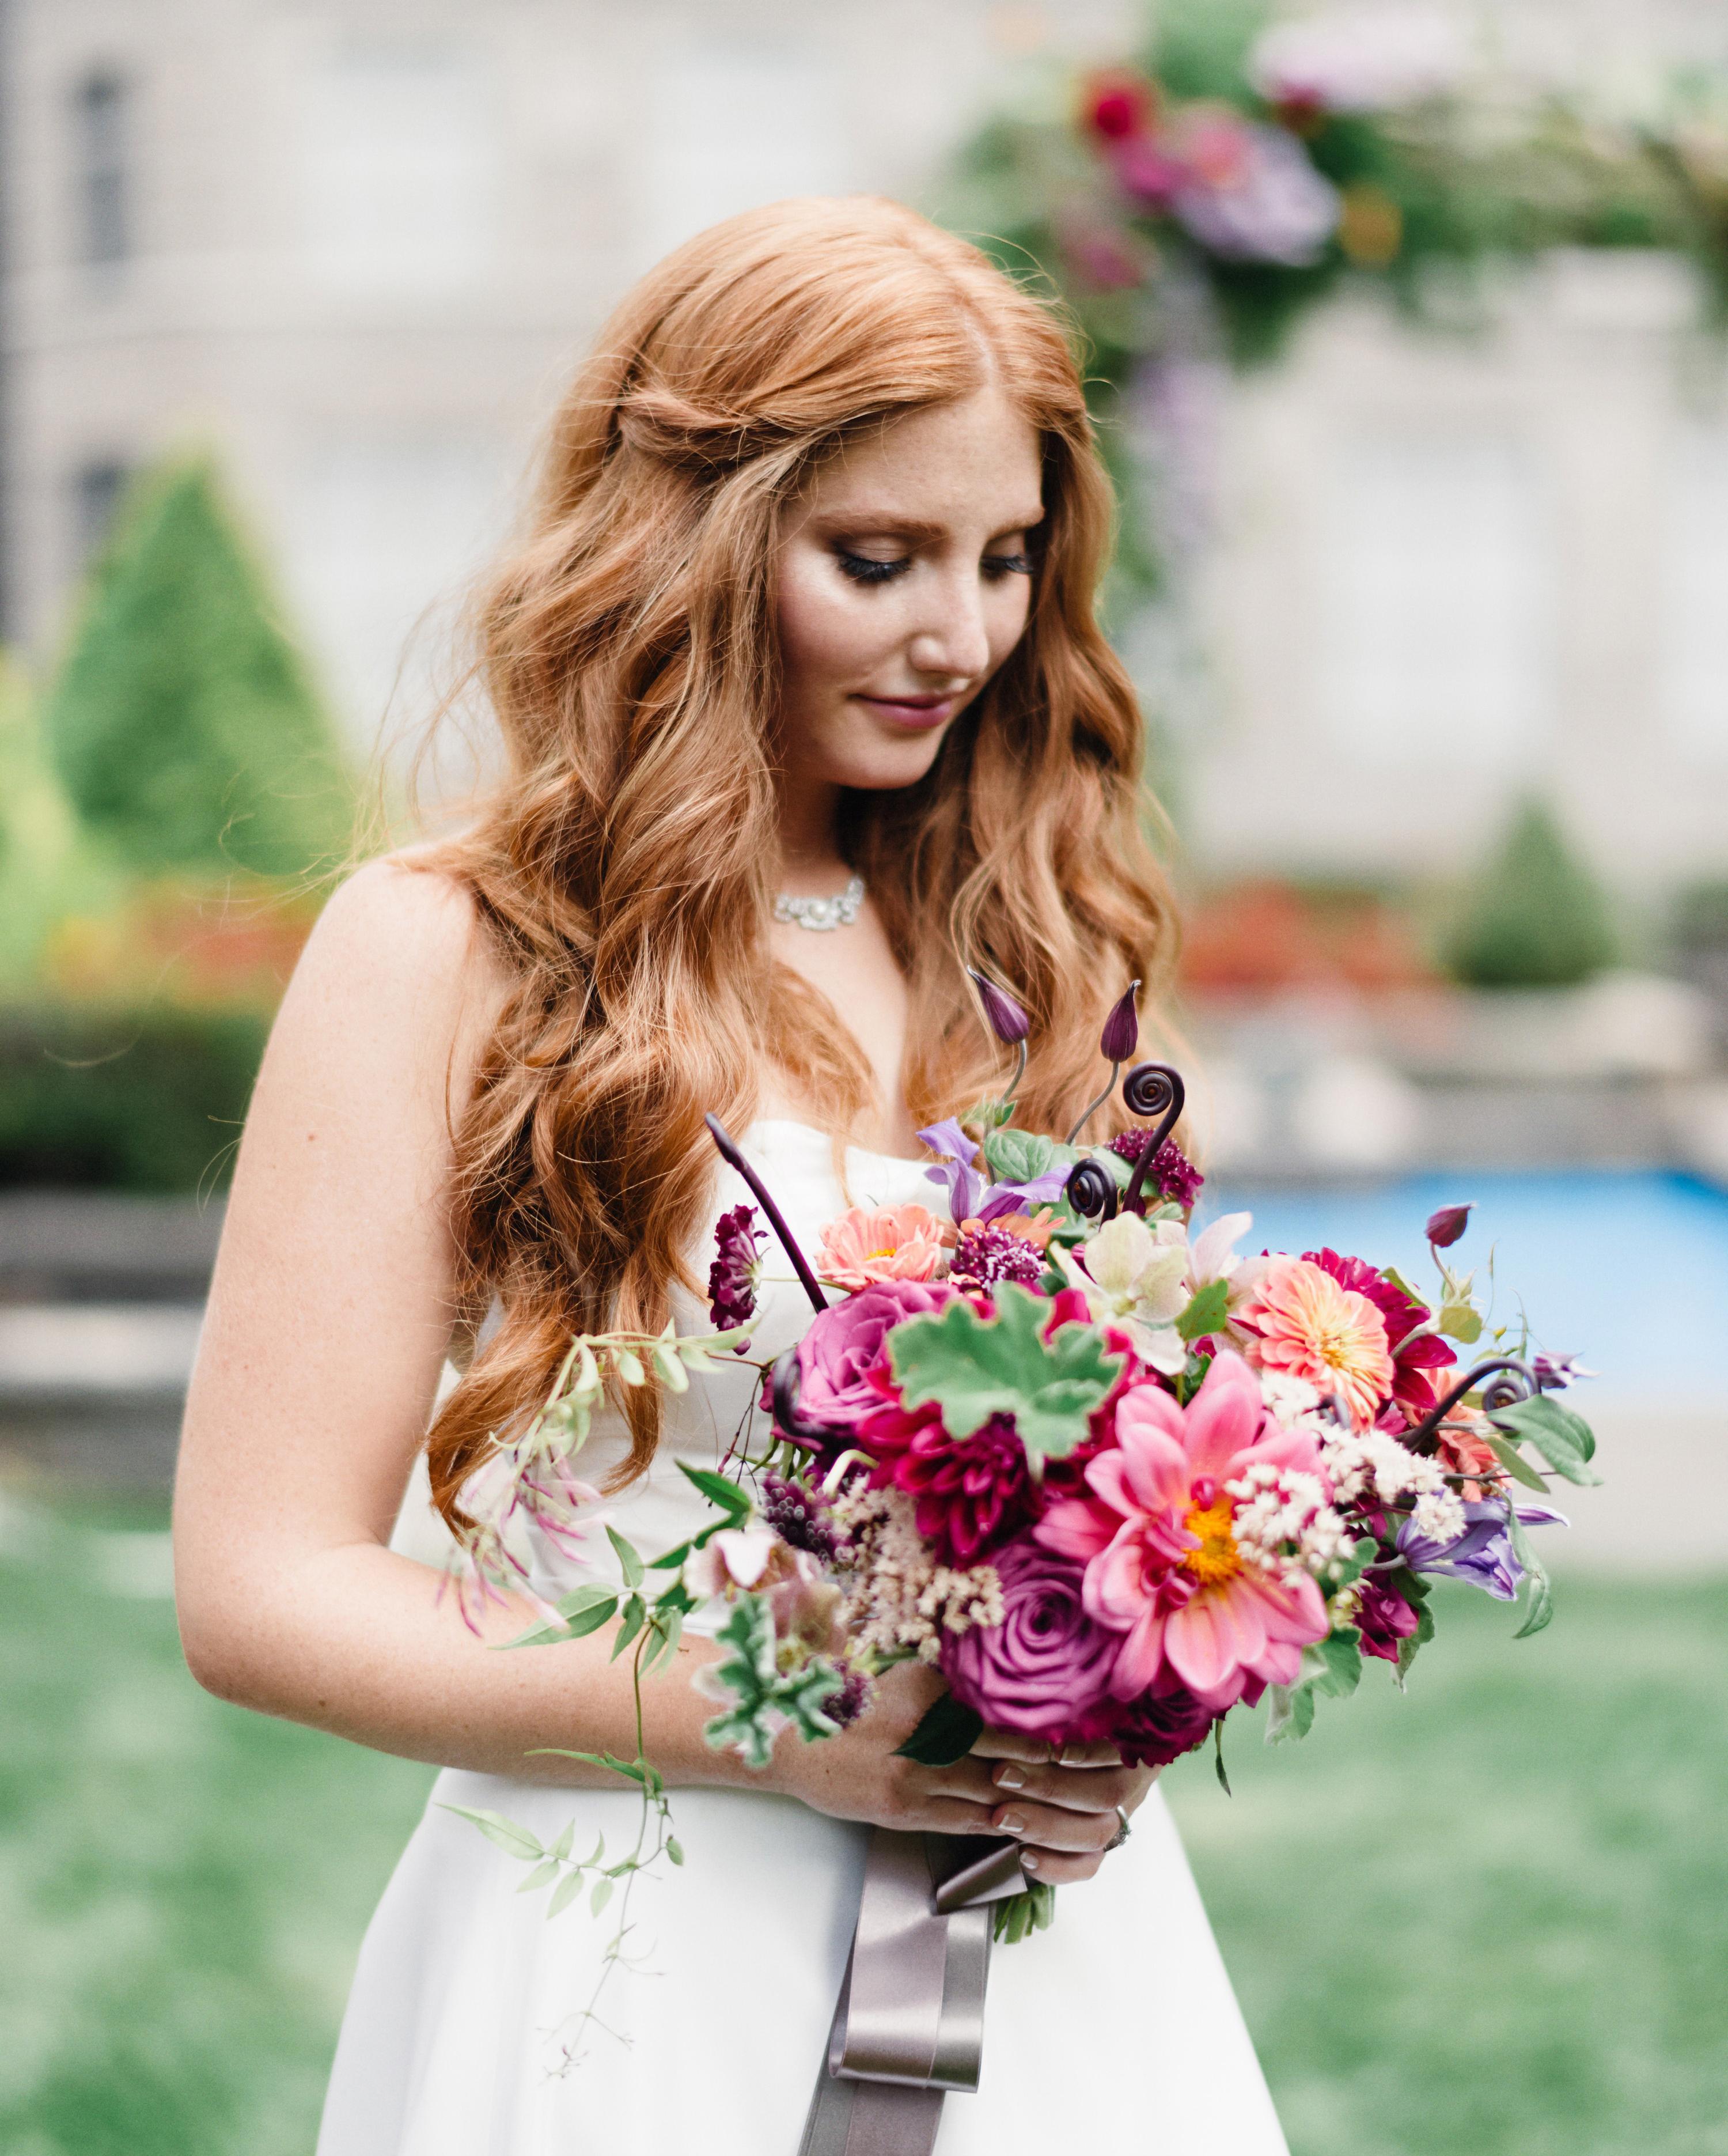 lilly-sean-wedding-bouquet-00186-s112089-0815.jpg